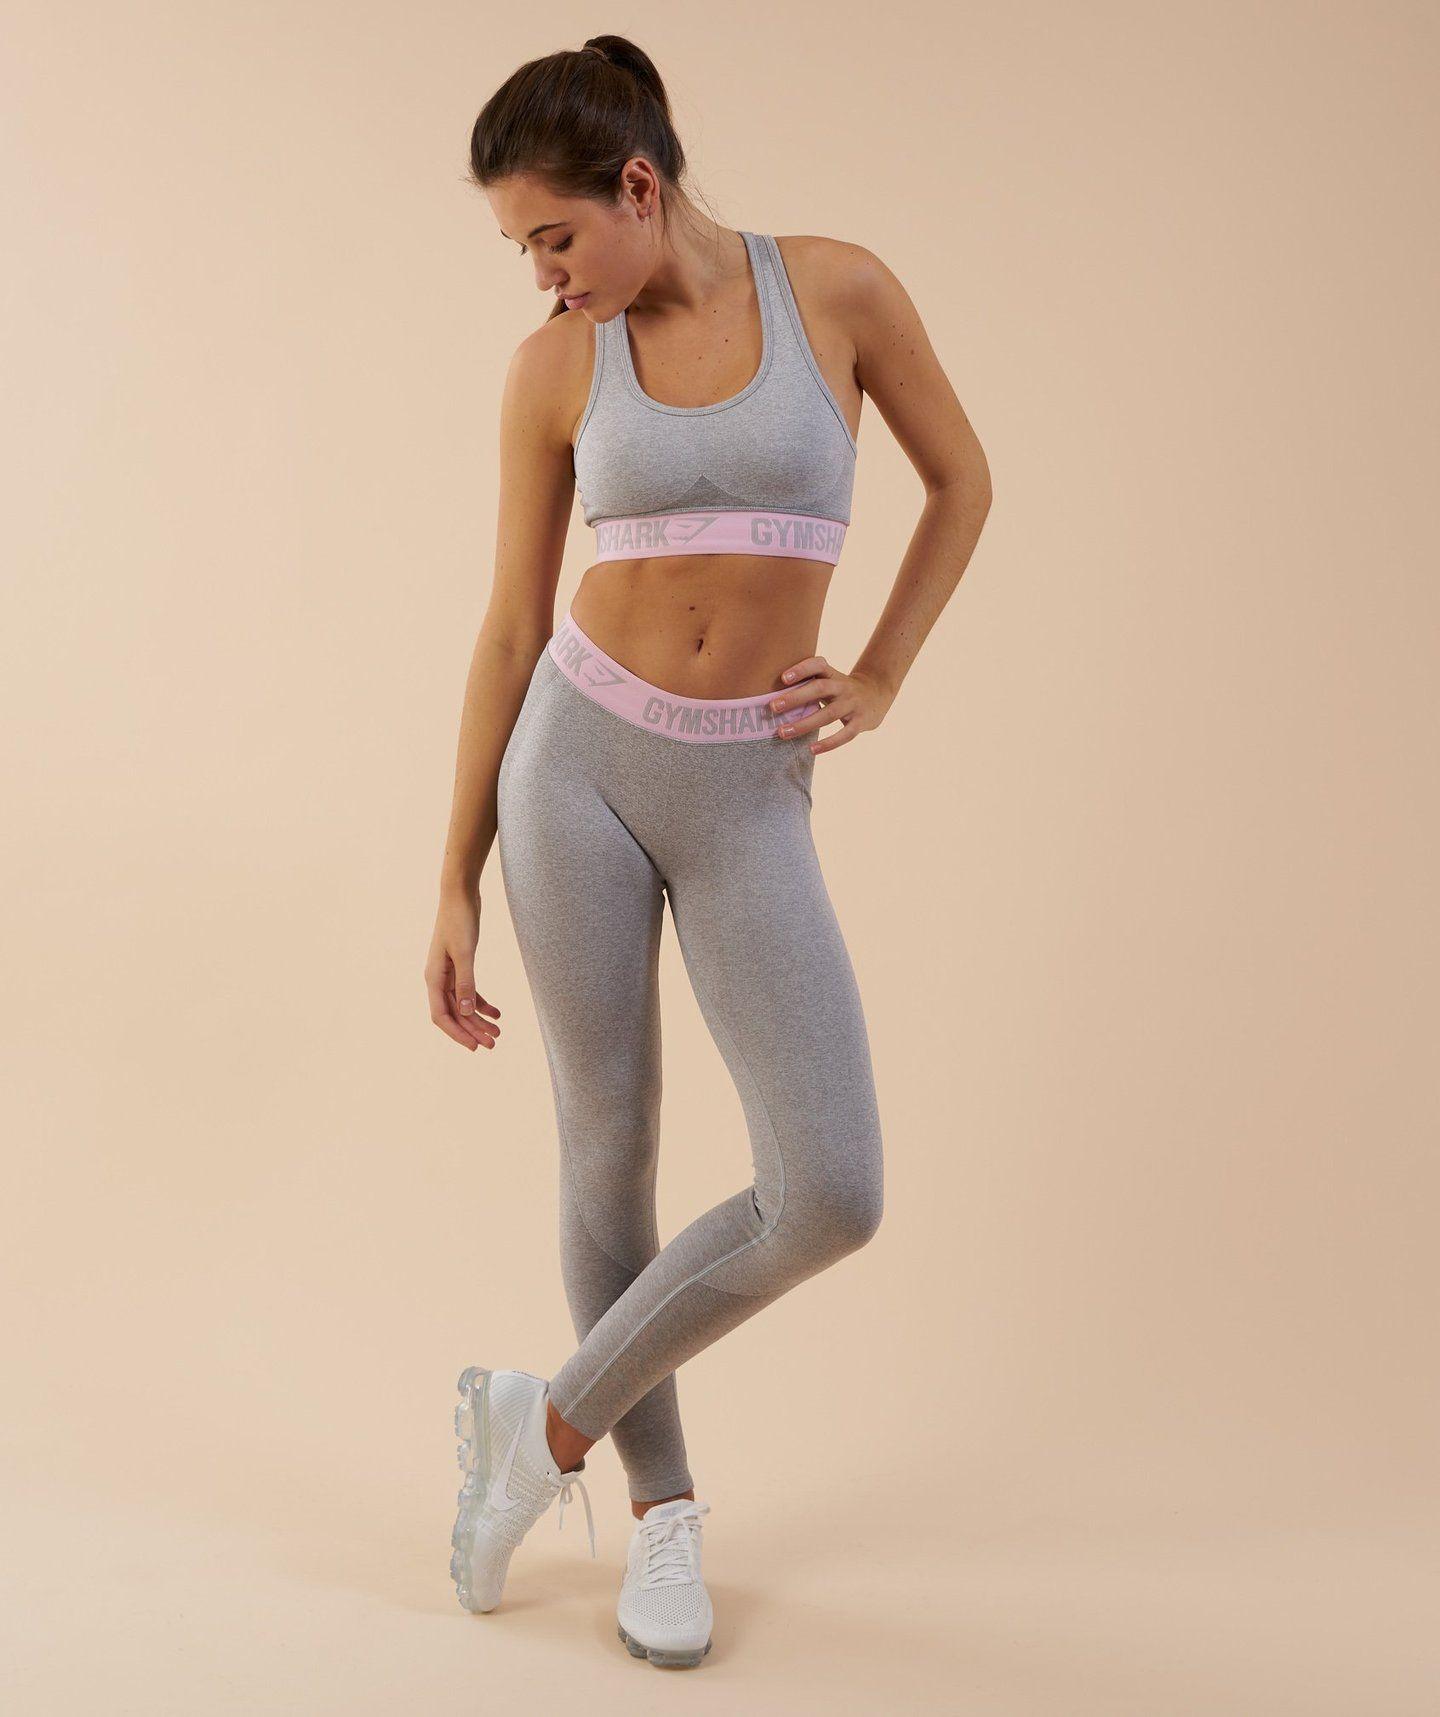 570c29a2ce483 Gymshark Flex Leggings - Light Grey Marl Chalk Pink 4